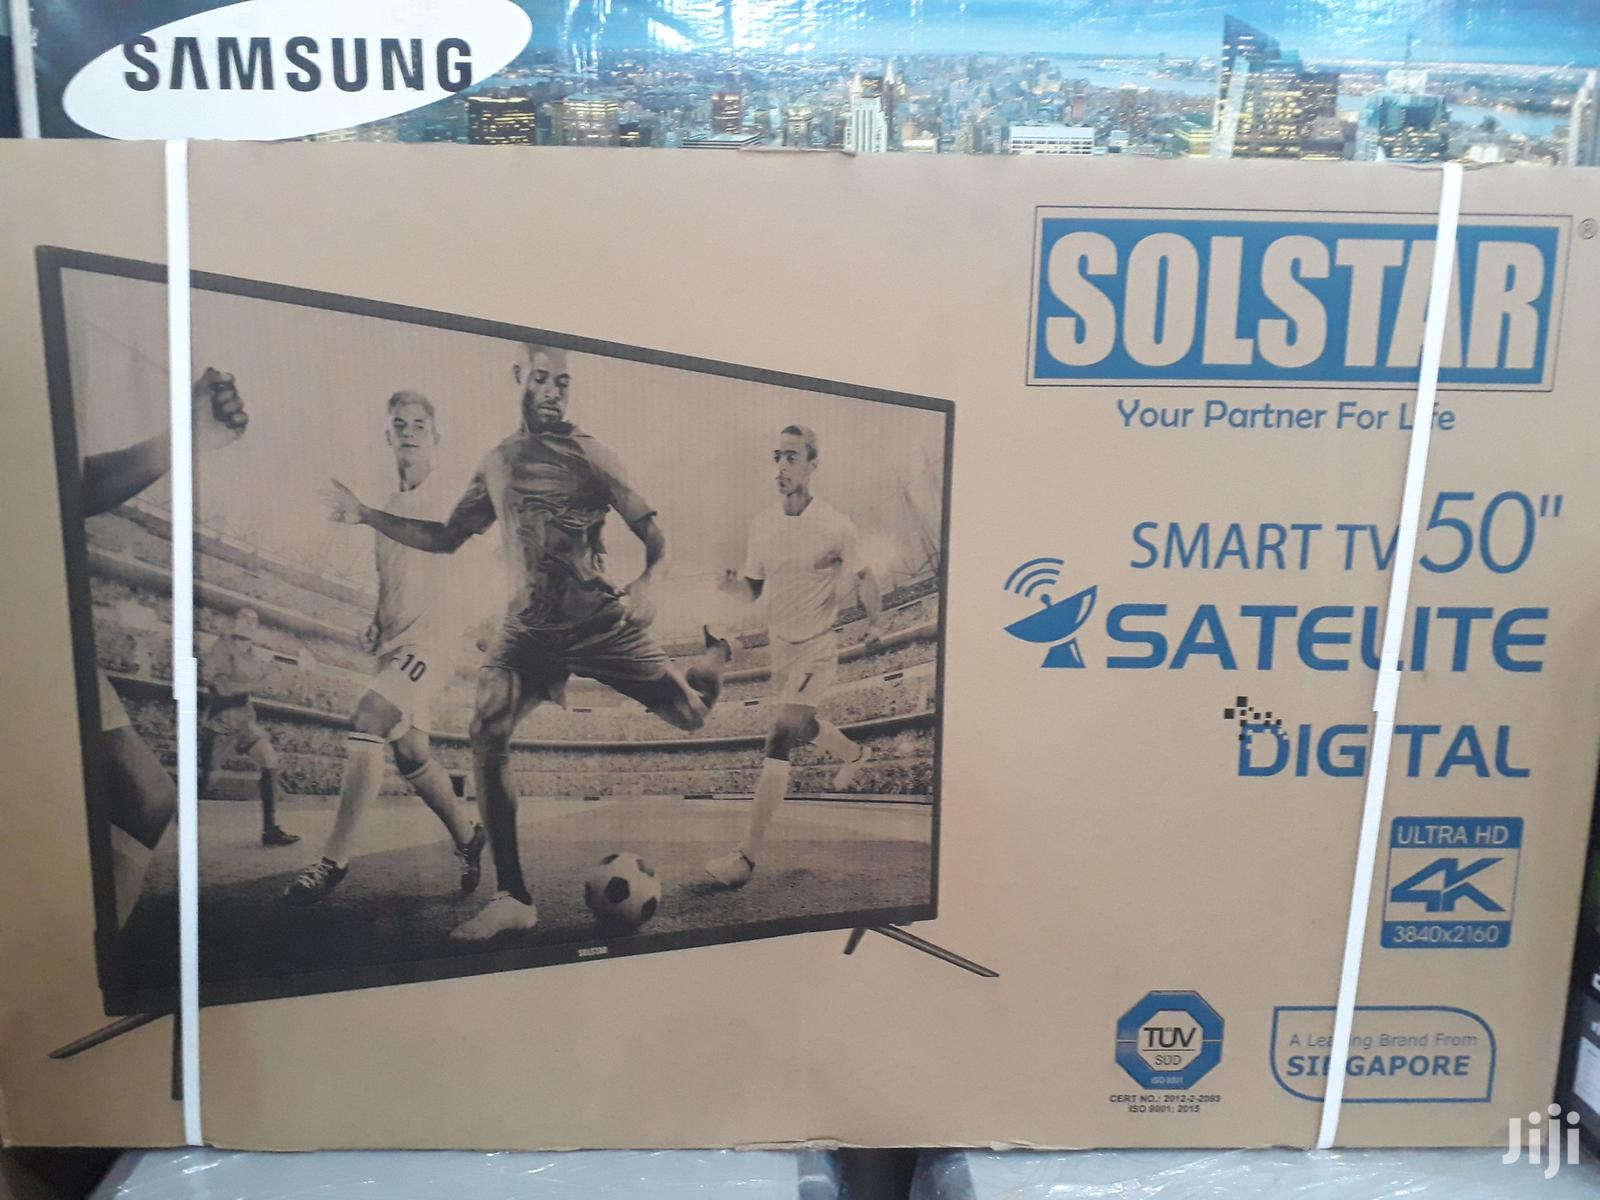 Solstar Satellite TV 50inch